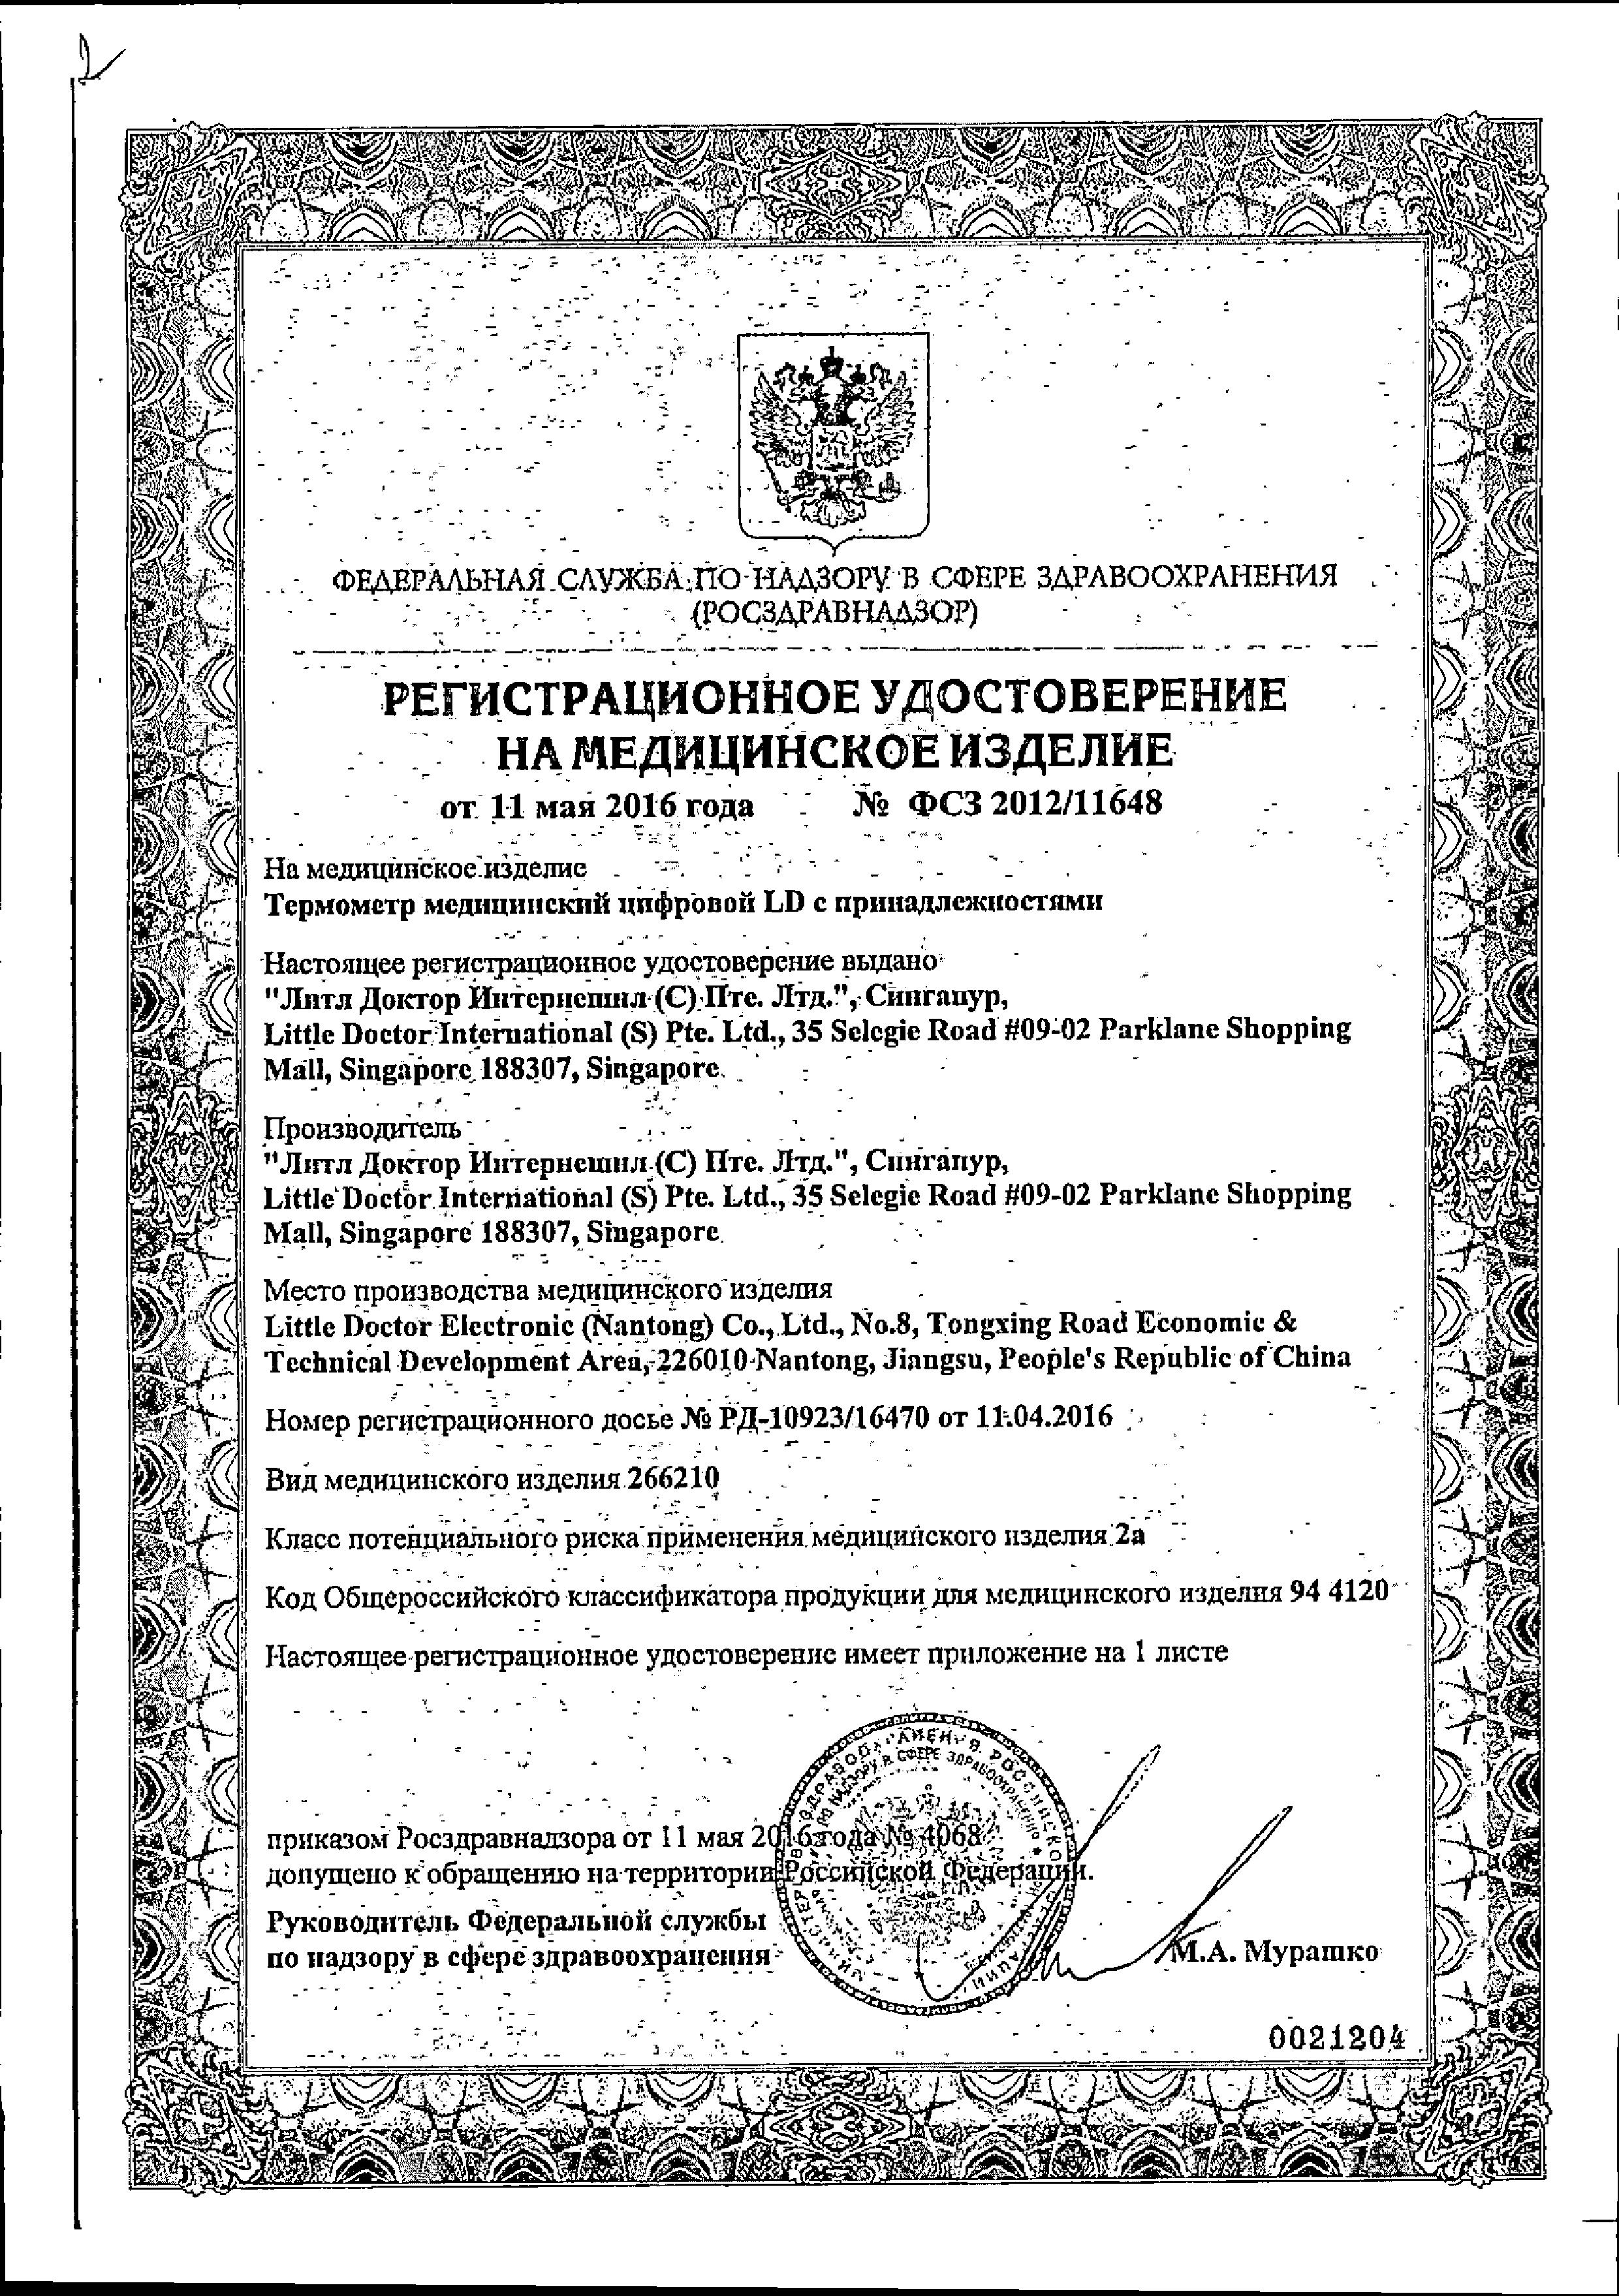 Термометр медицинский цифровой LD-302 сертификат